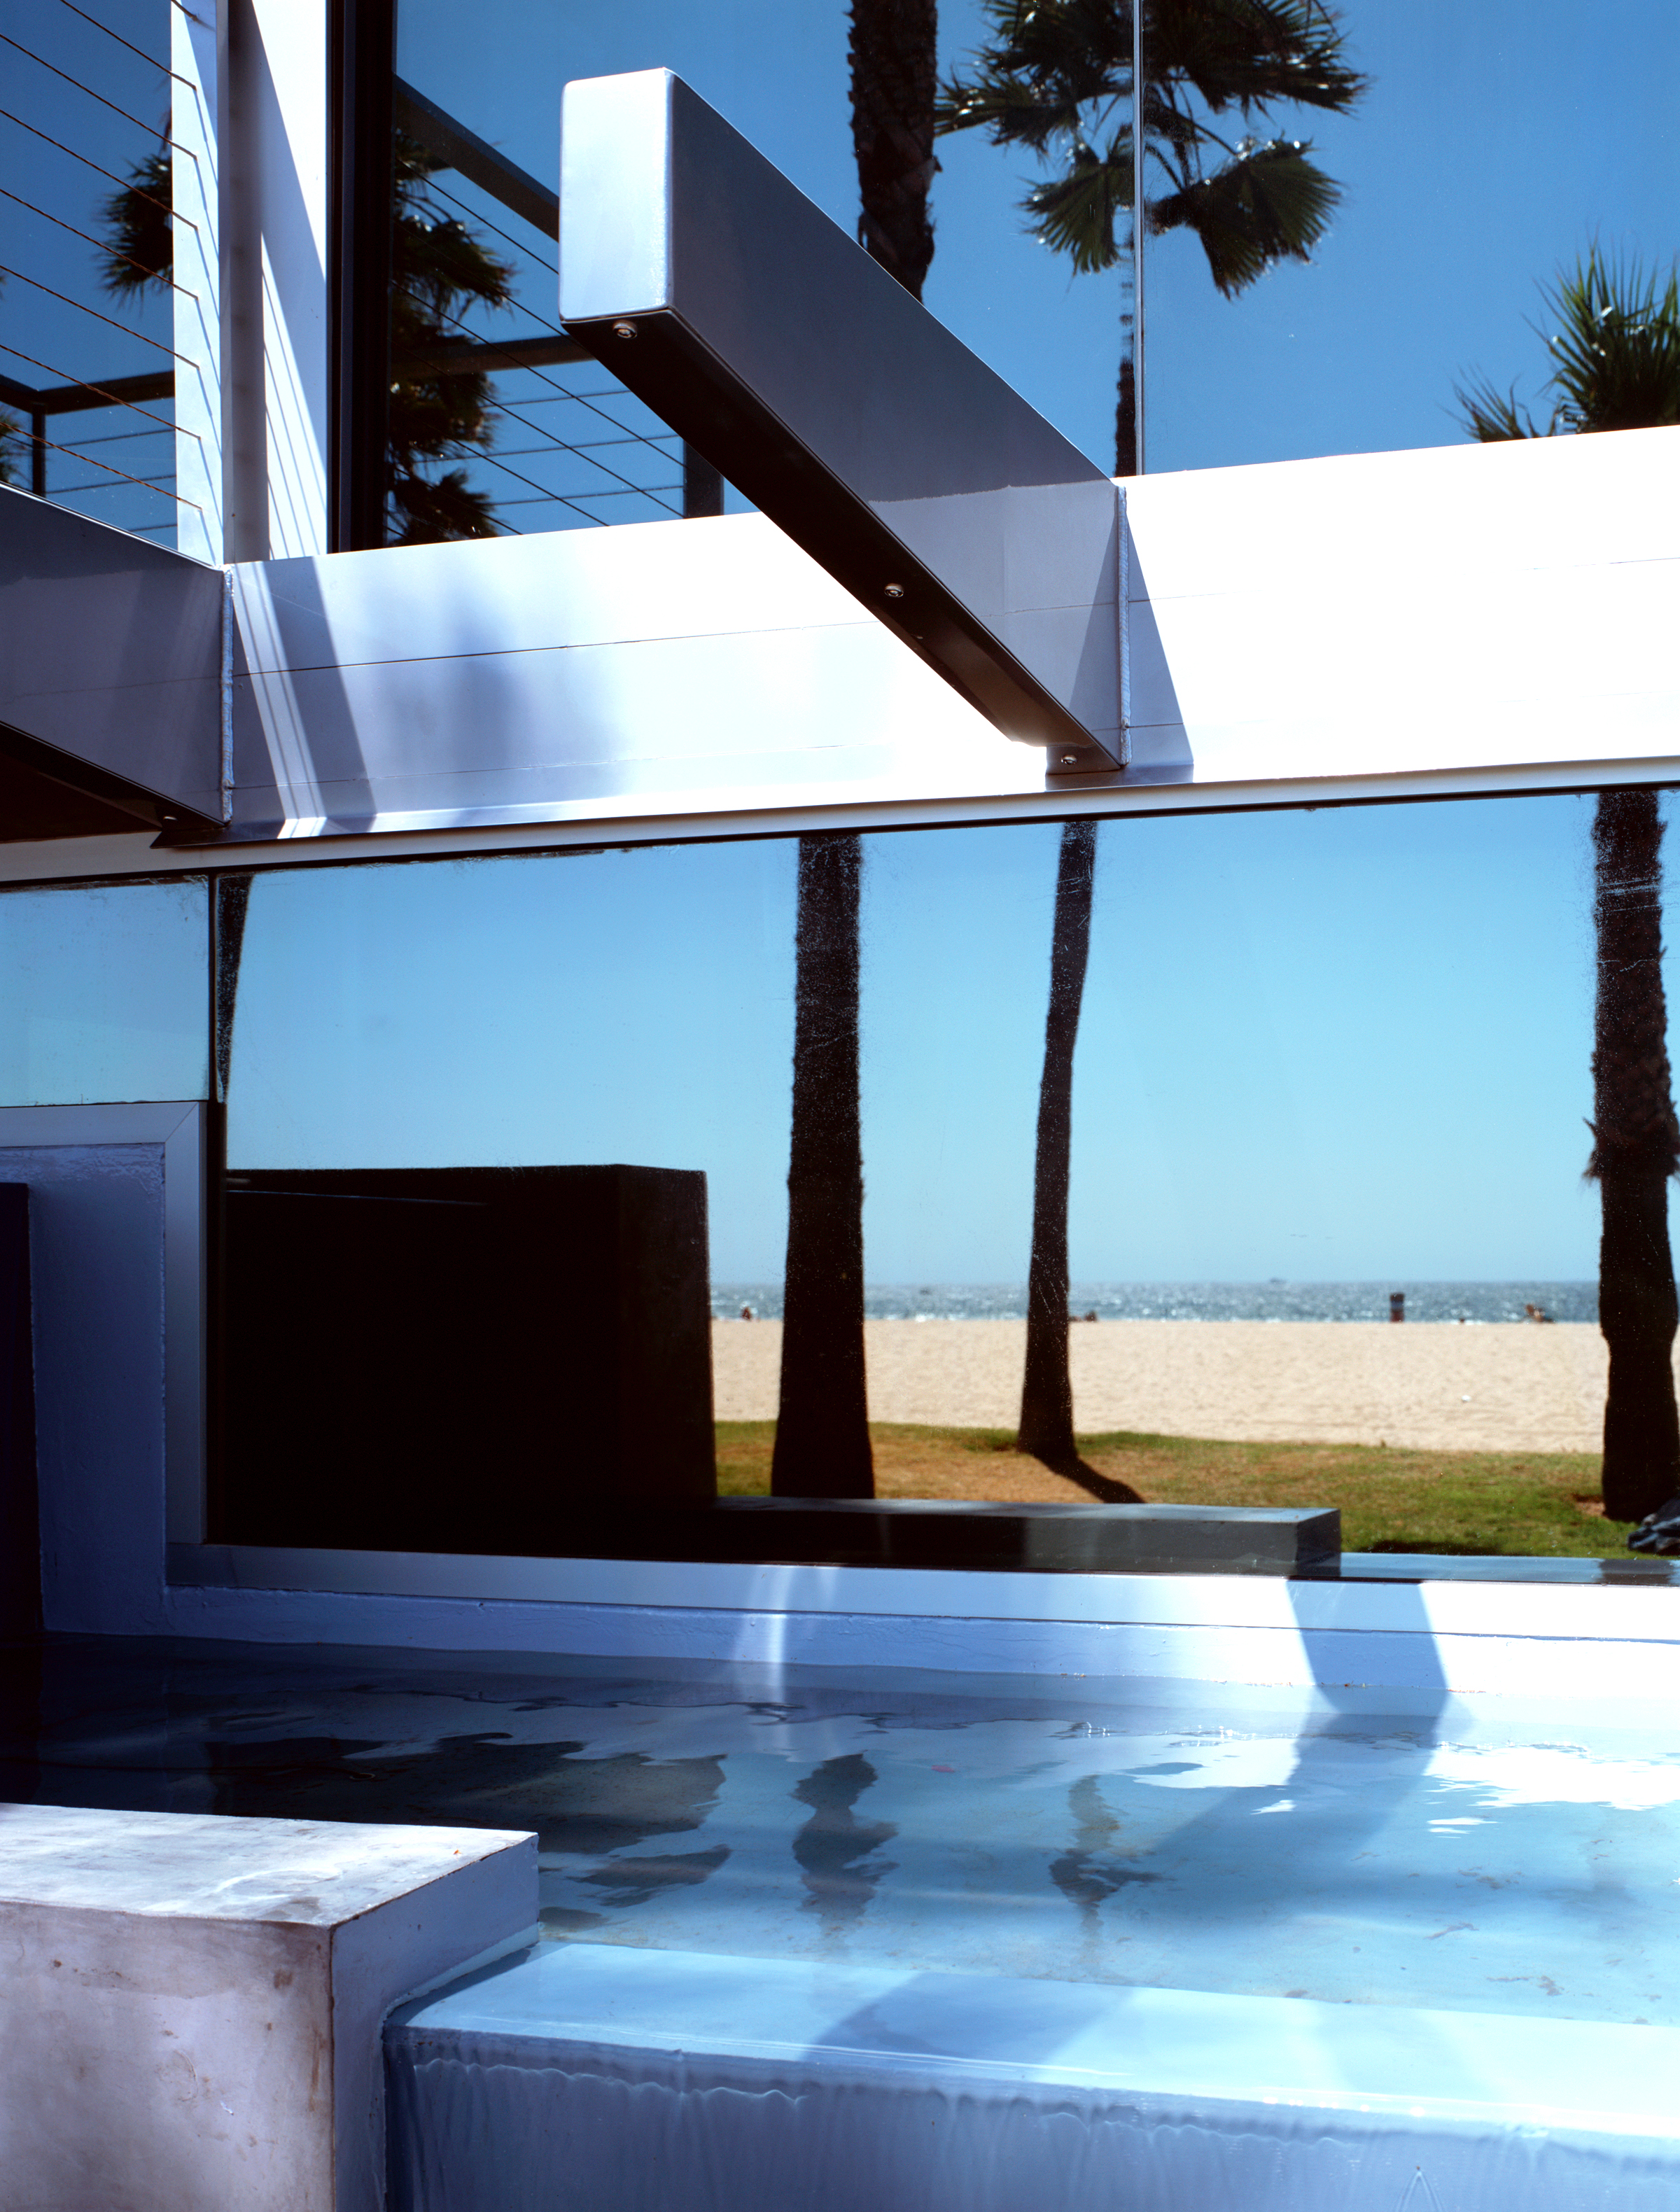 S.E.A.-Studio-Environmental-Architecture-David-Hertz-FAIA-Panel-House-Venice-Beach-California-sustainable-regenerative-restorative-green-design-prefabricated-aluminum-refrigeration-open-concept-ocean-view-residential-glass-steel-sunset-exterior-13.jpg